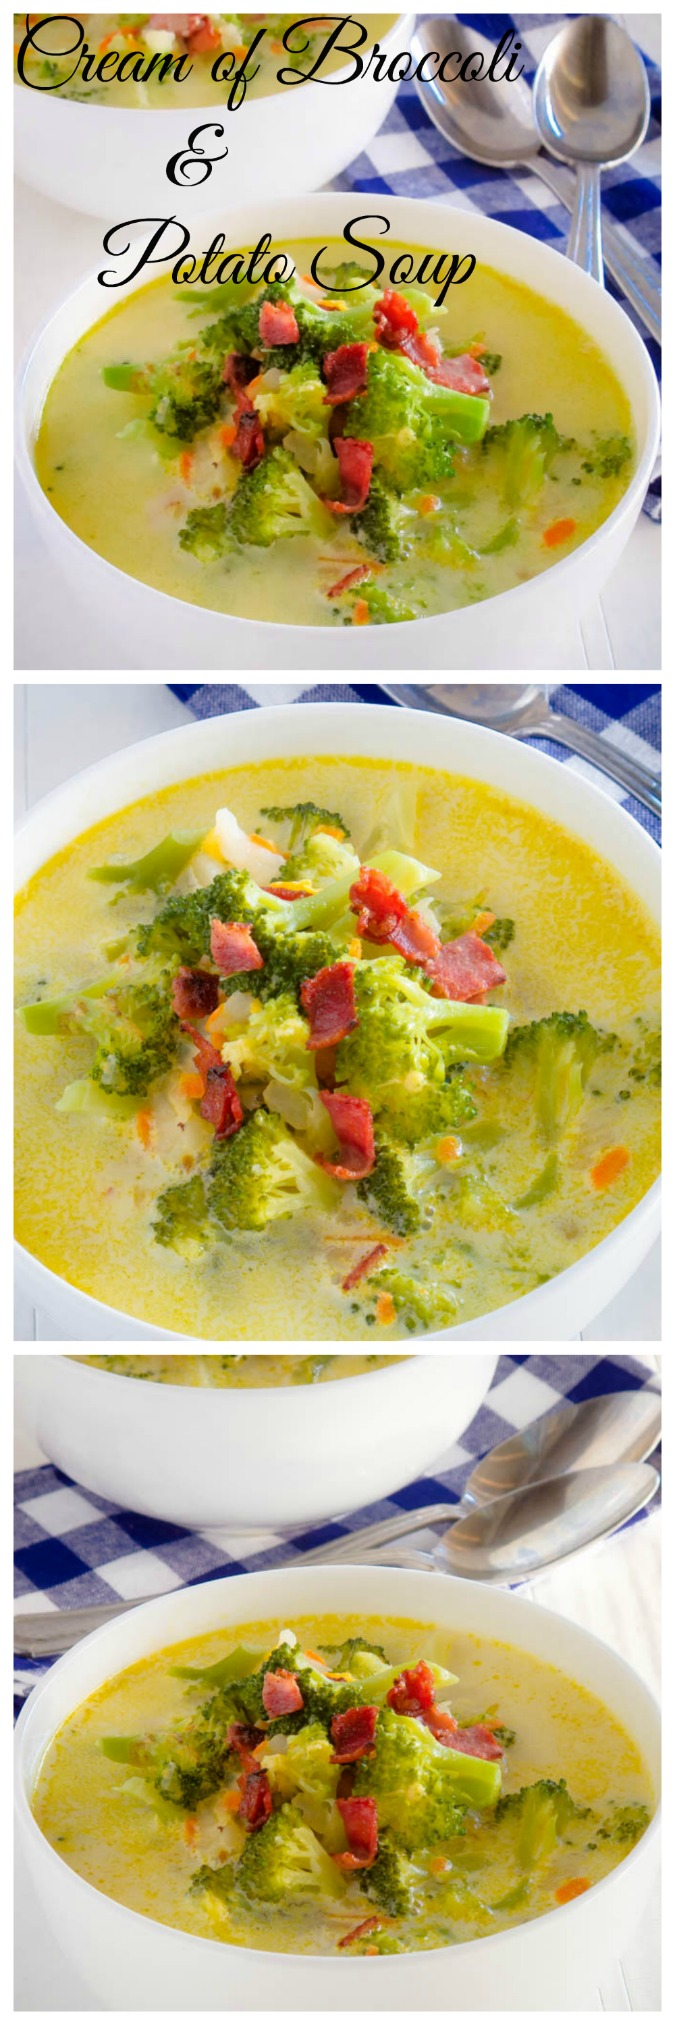 delicious creamy broccoli and potato soup!!